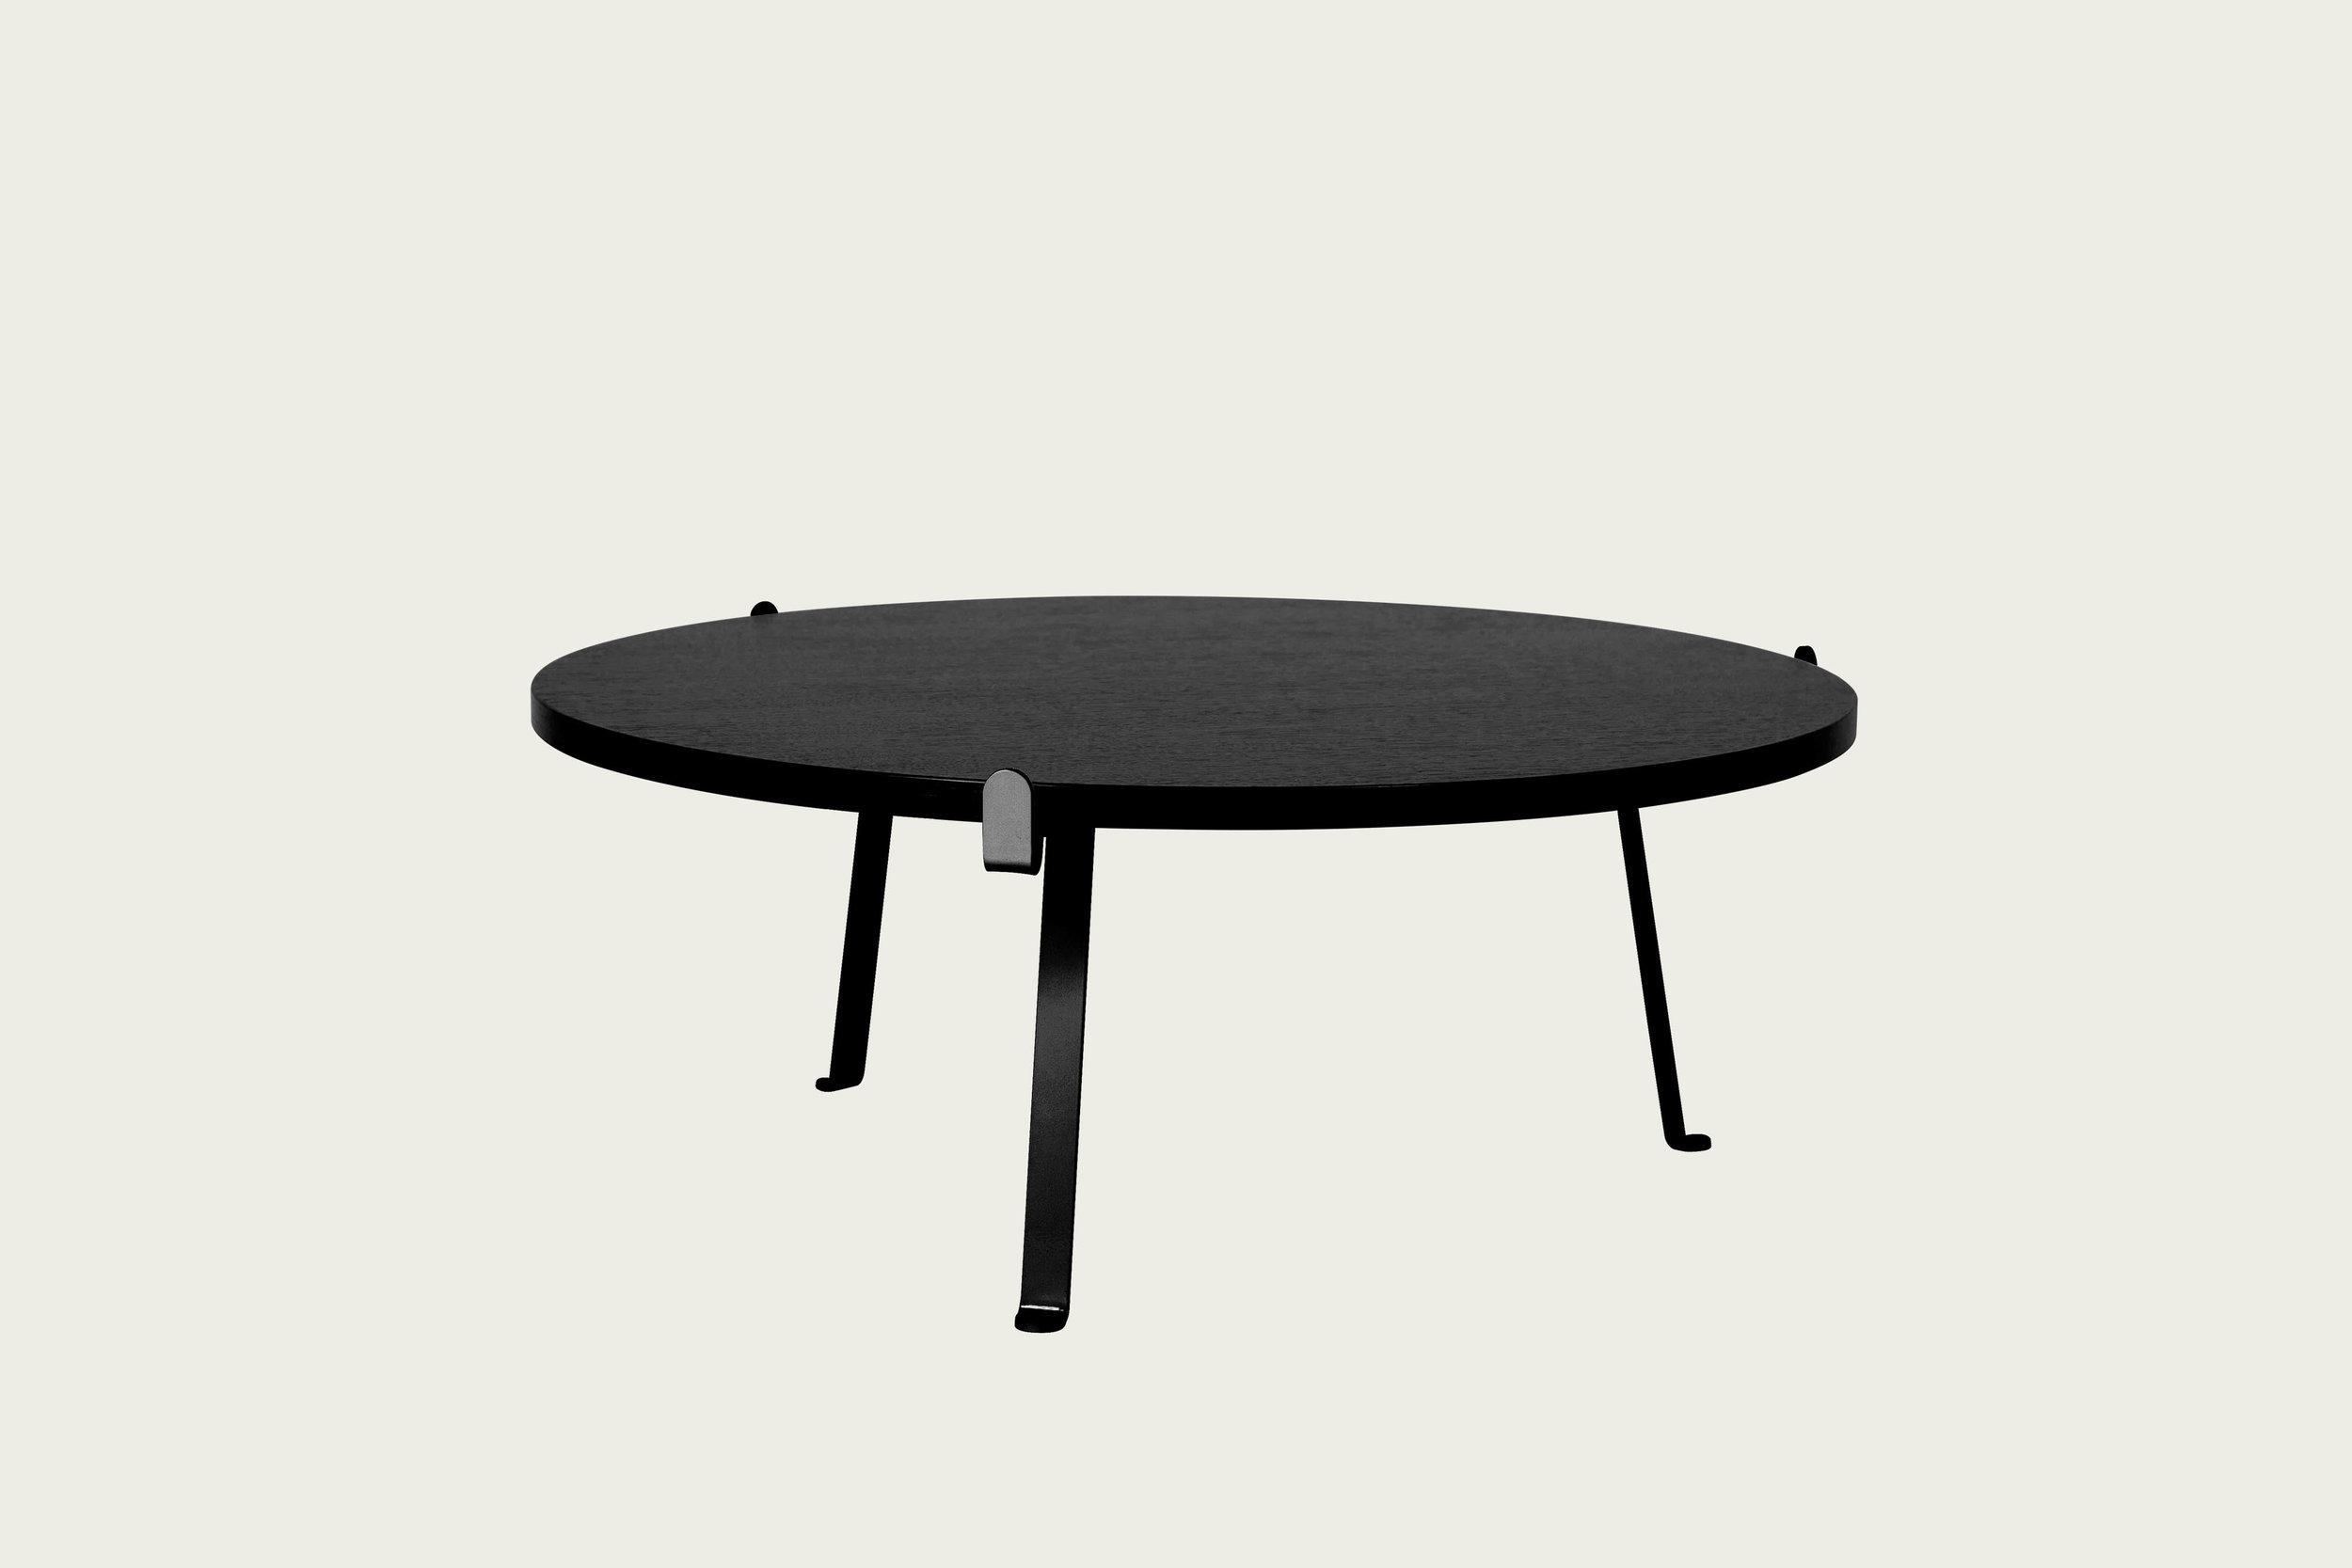 165211_ARCH sofa table_black_black_highres (3) kopier.jpg